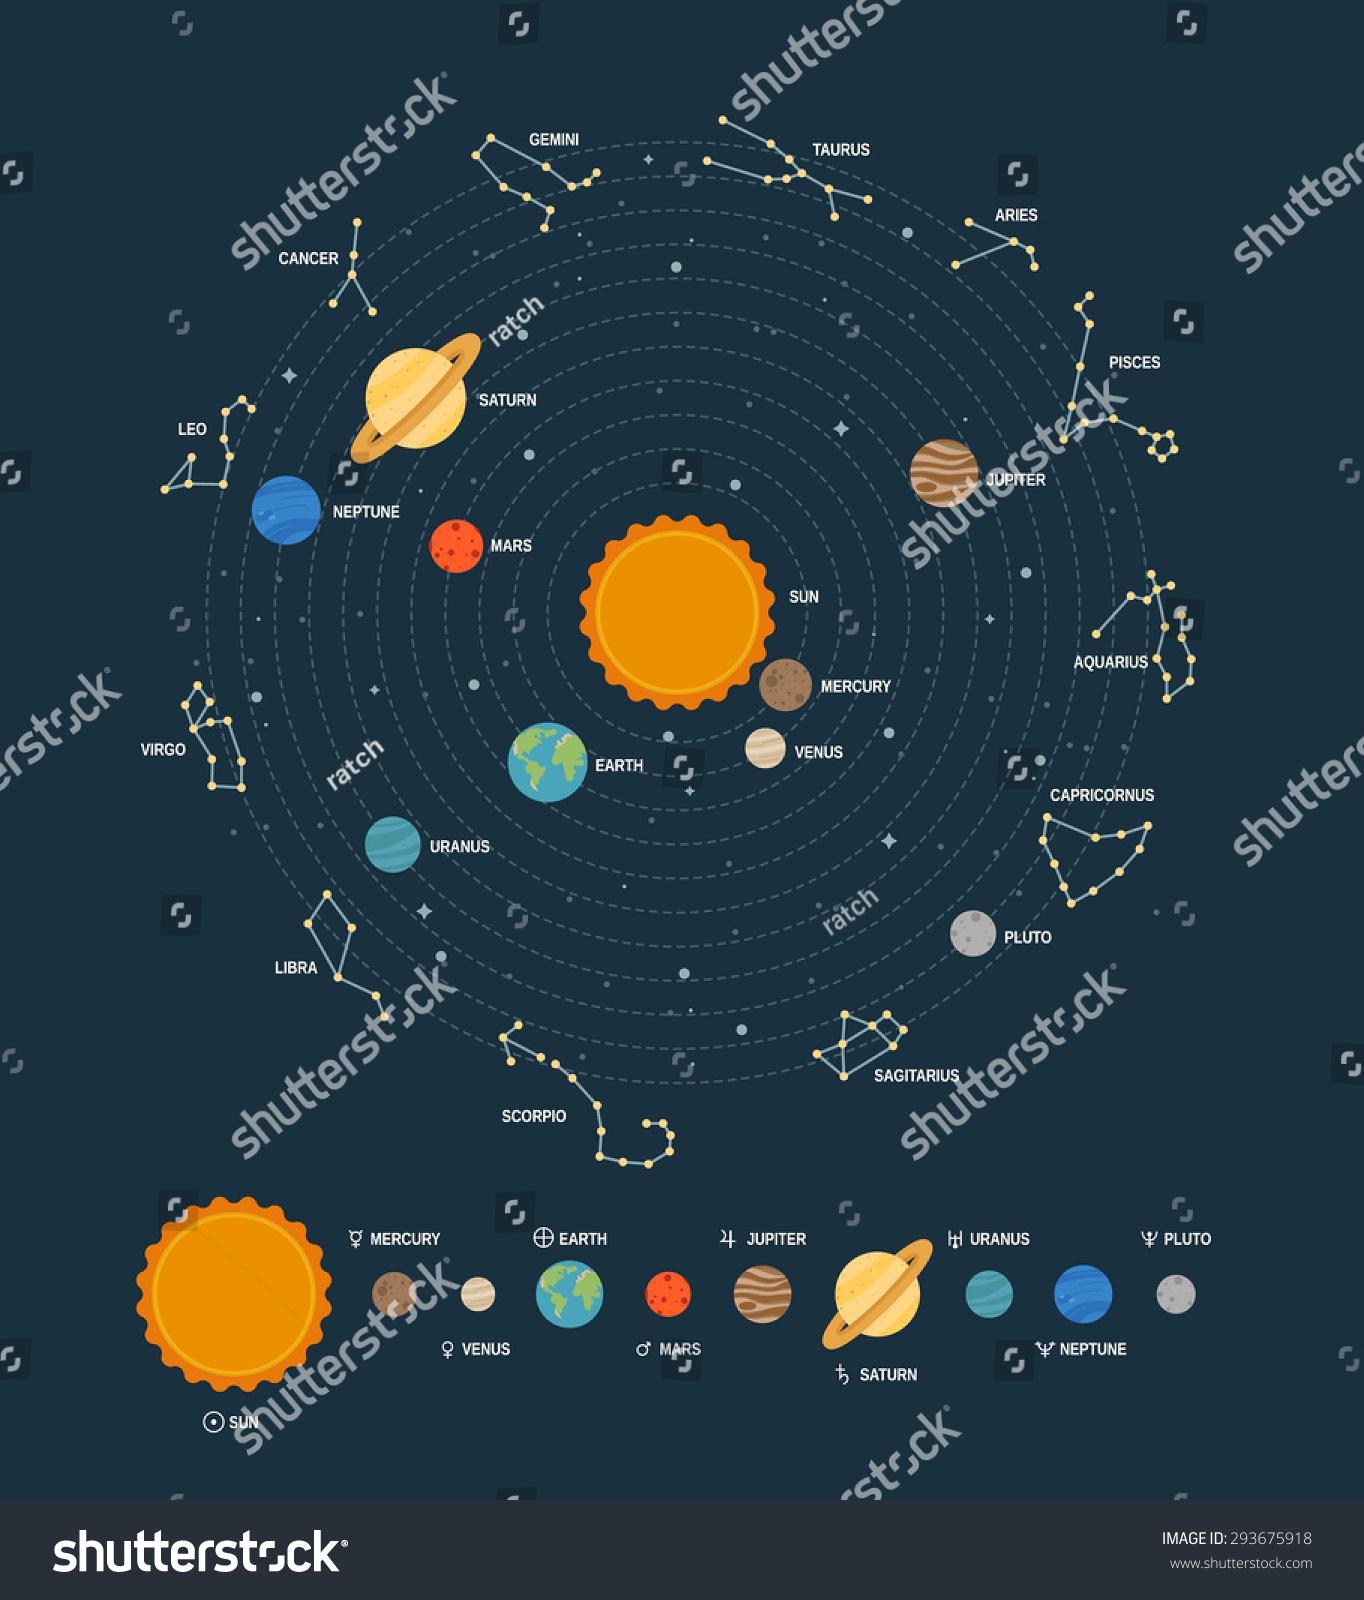 solar system vector - photo #18